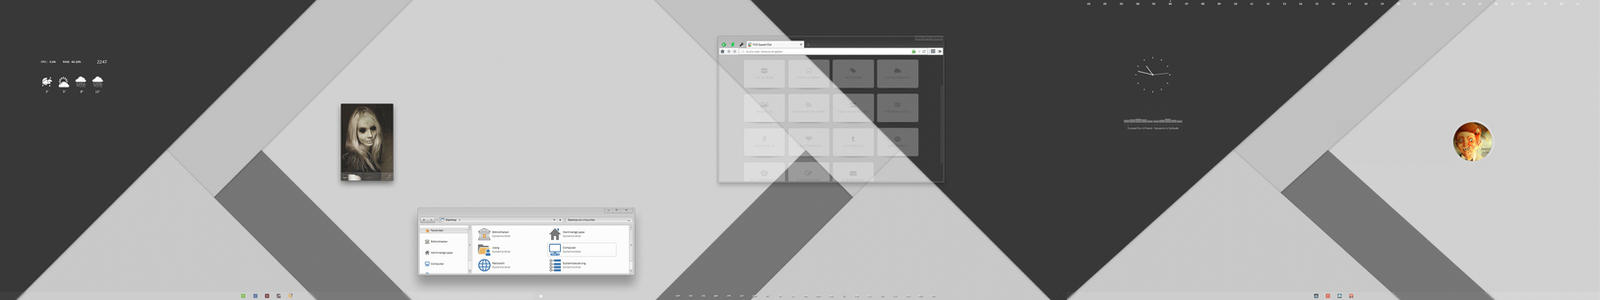 Pimp-My-Desktop-Part-62 by Joergermeister